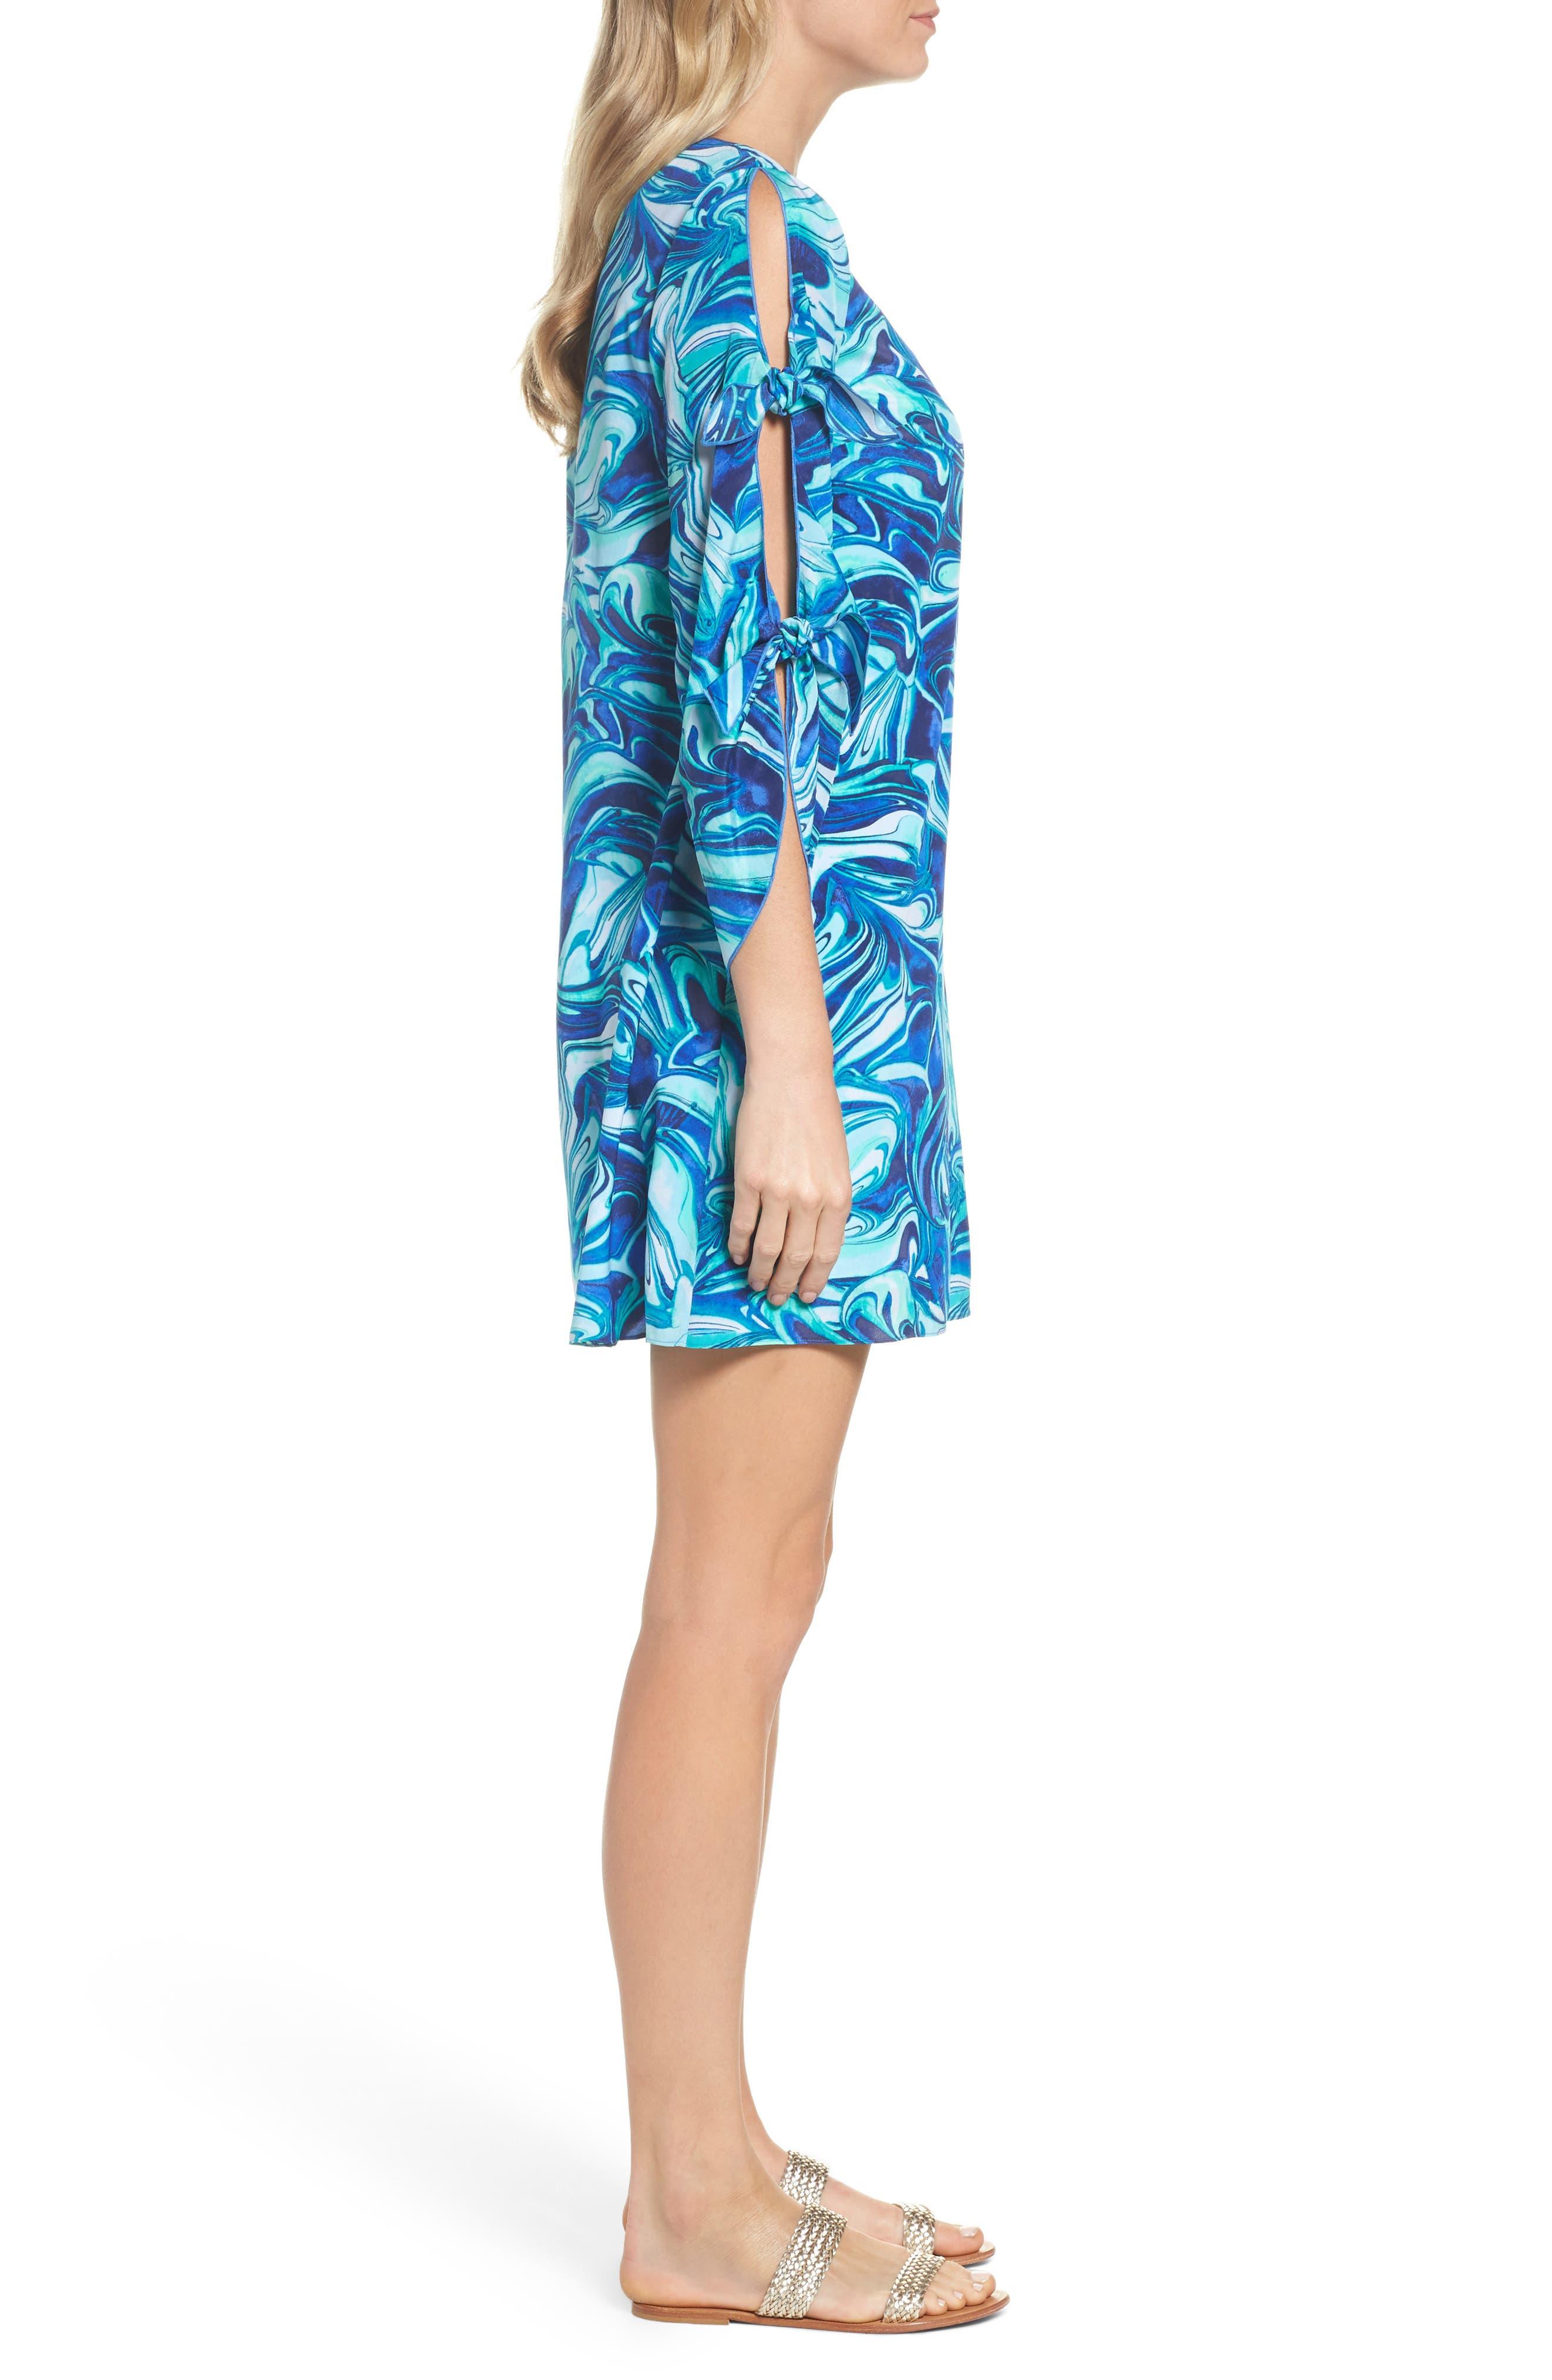 Avila Shift Dress,                             Alternate thumbnail 3, color,                             Ikat Blue Ocean Waves